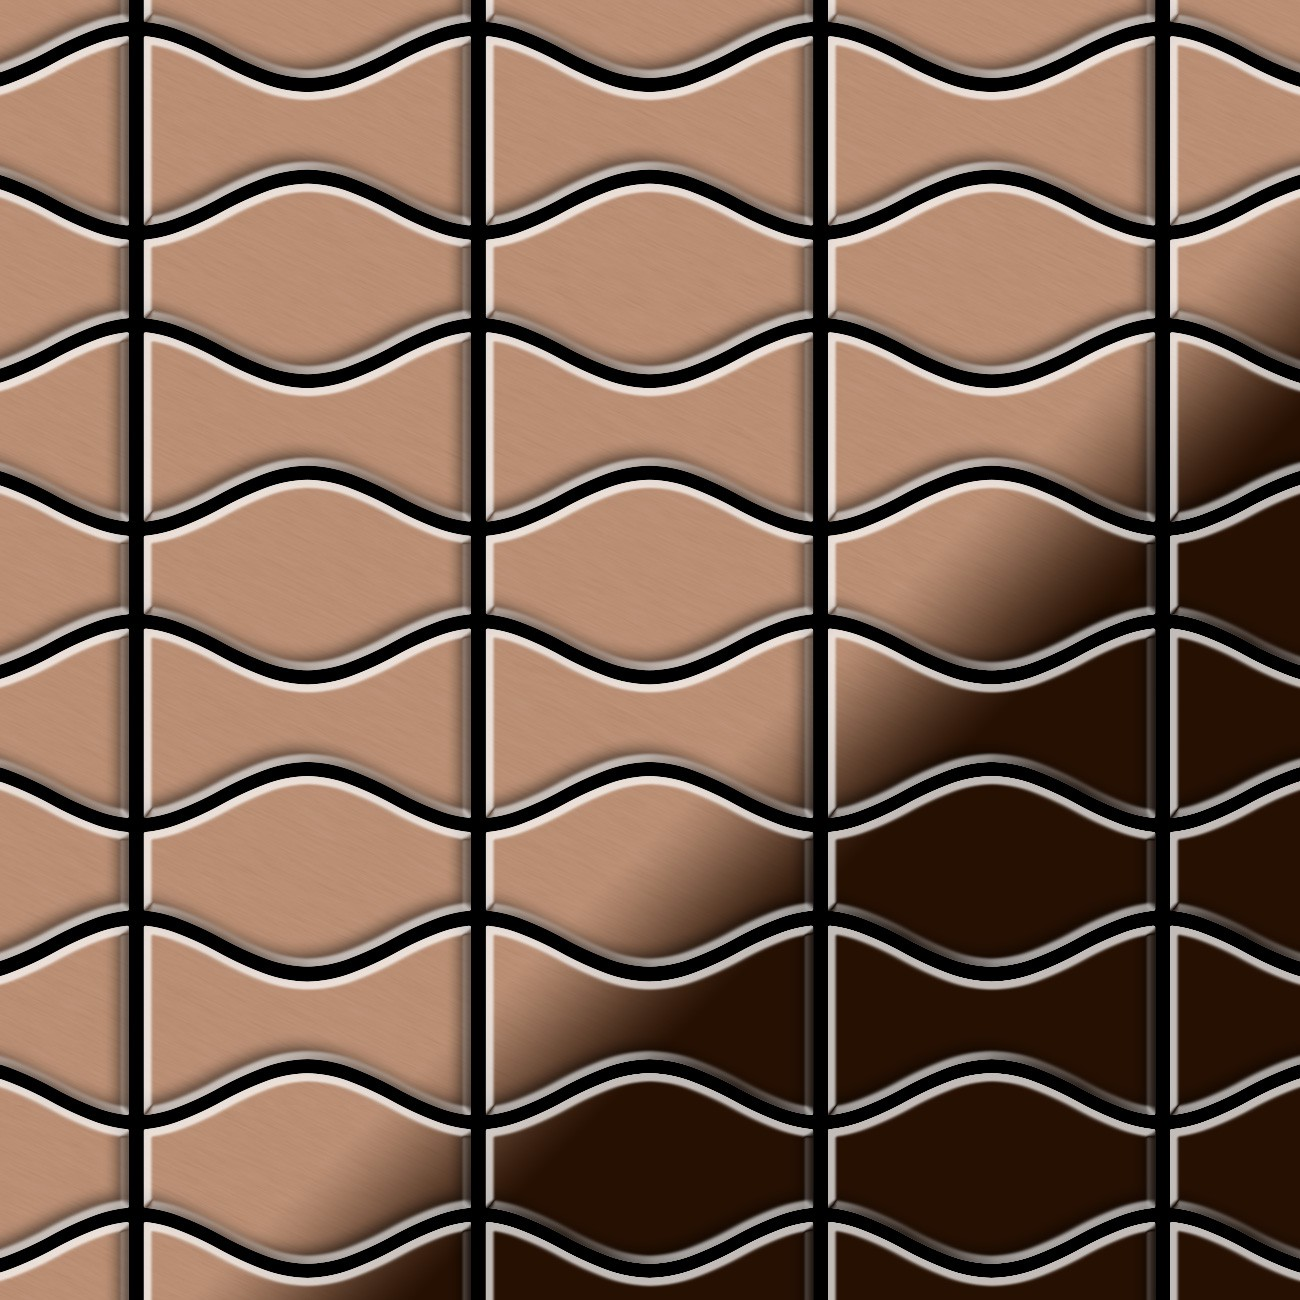 mosaik fliese massiv metall kupfer gewalzt kupfer 1 6mm kismet karma cm ebay. Black Bedroom Furniture Sets. Home Design Ideas